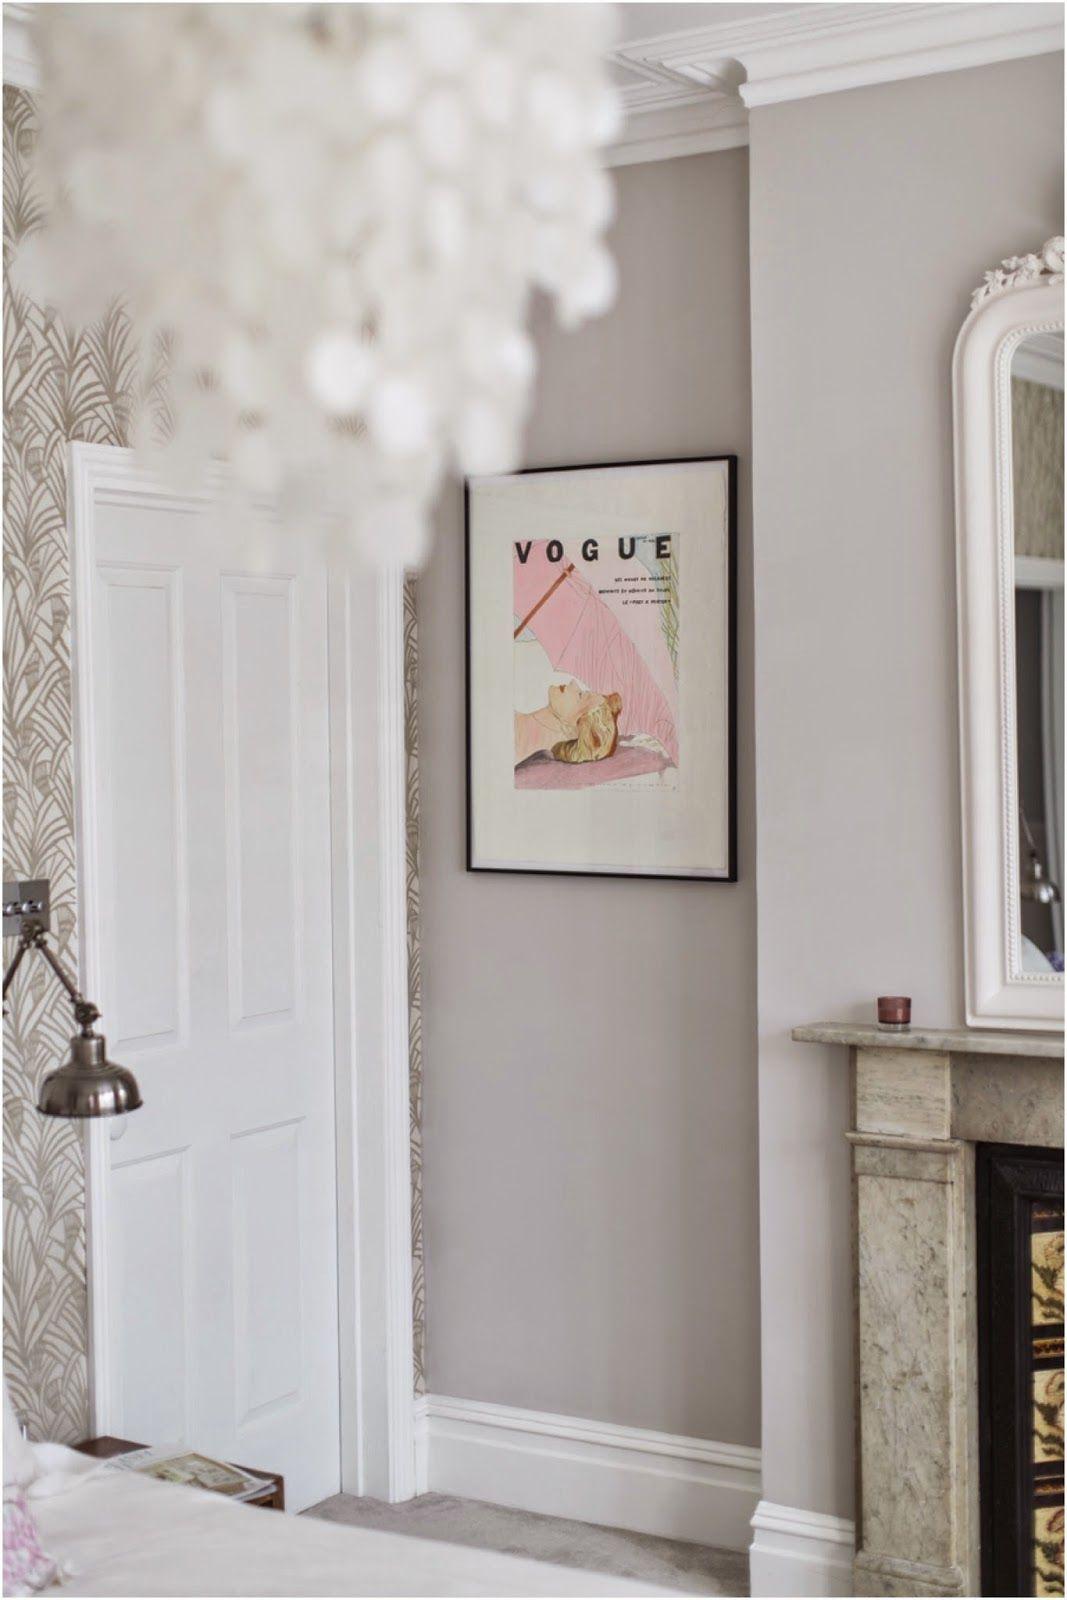 bedroom complete! farrow & ball cornforth white walls, tapet cafe